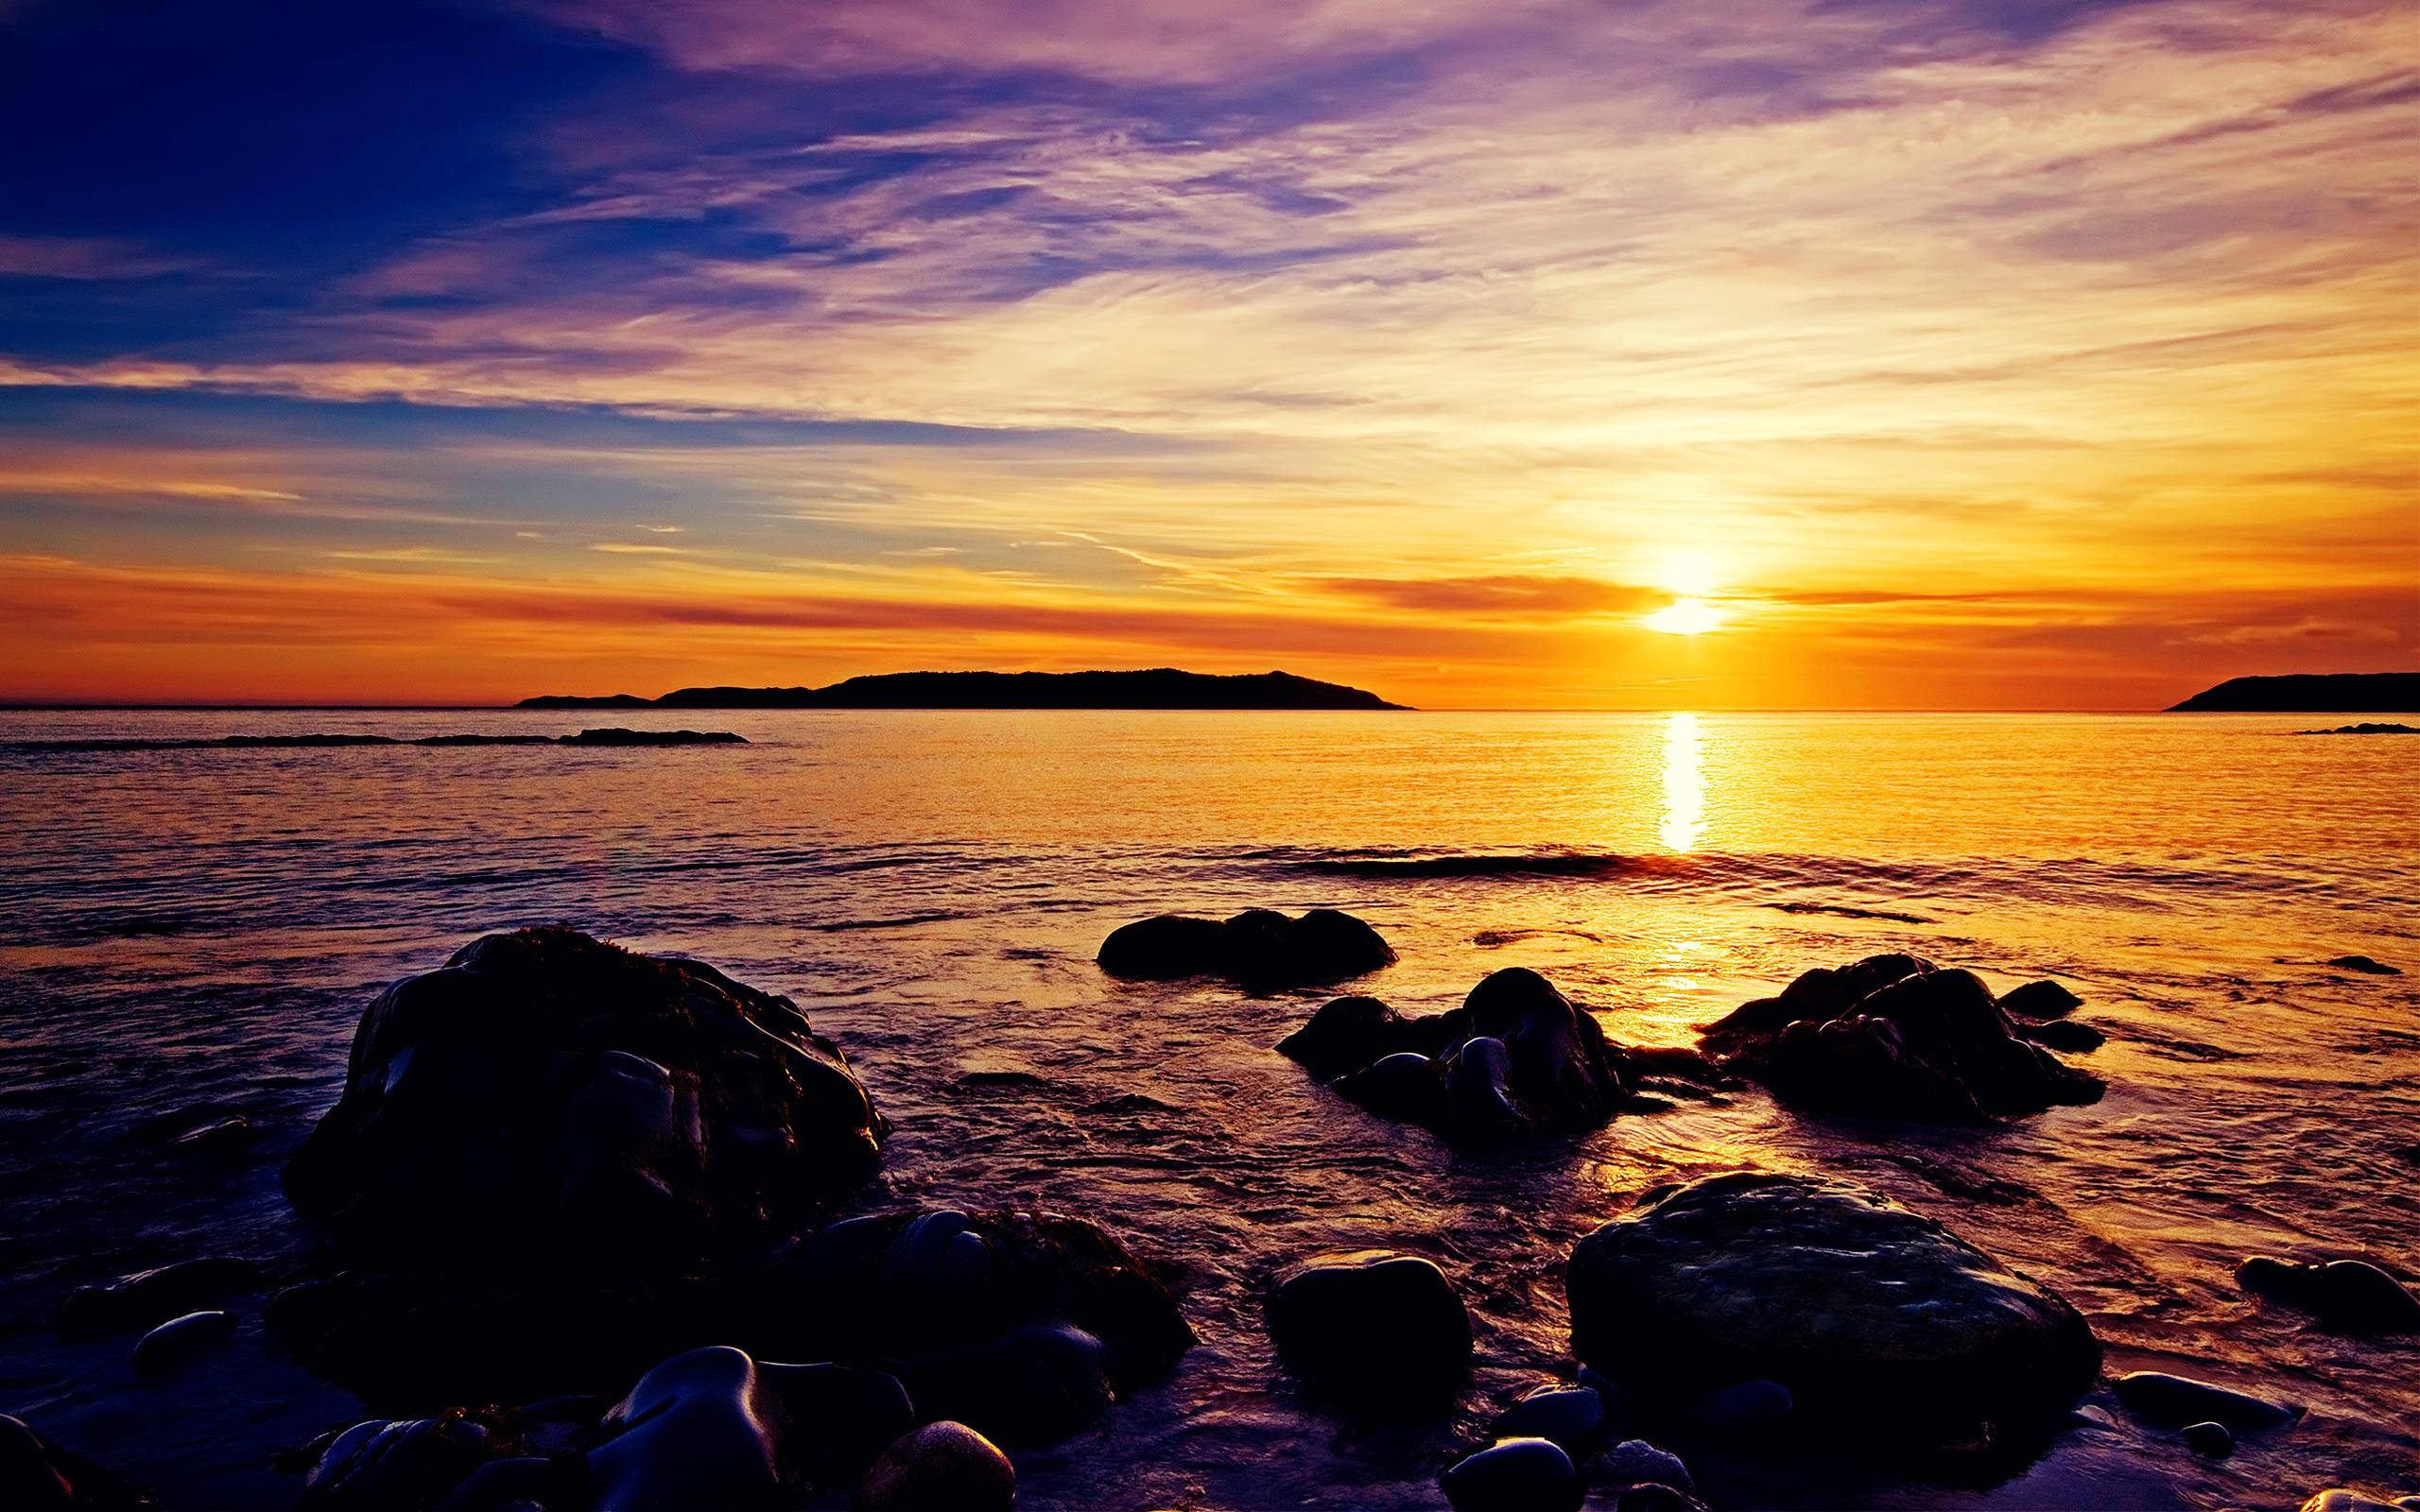 Amazing Sunrise at Beach Wallpaper